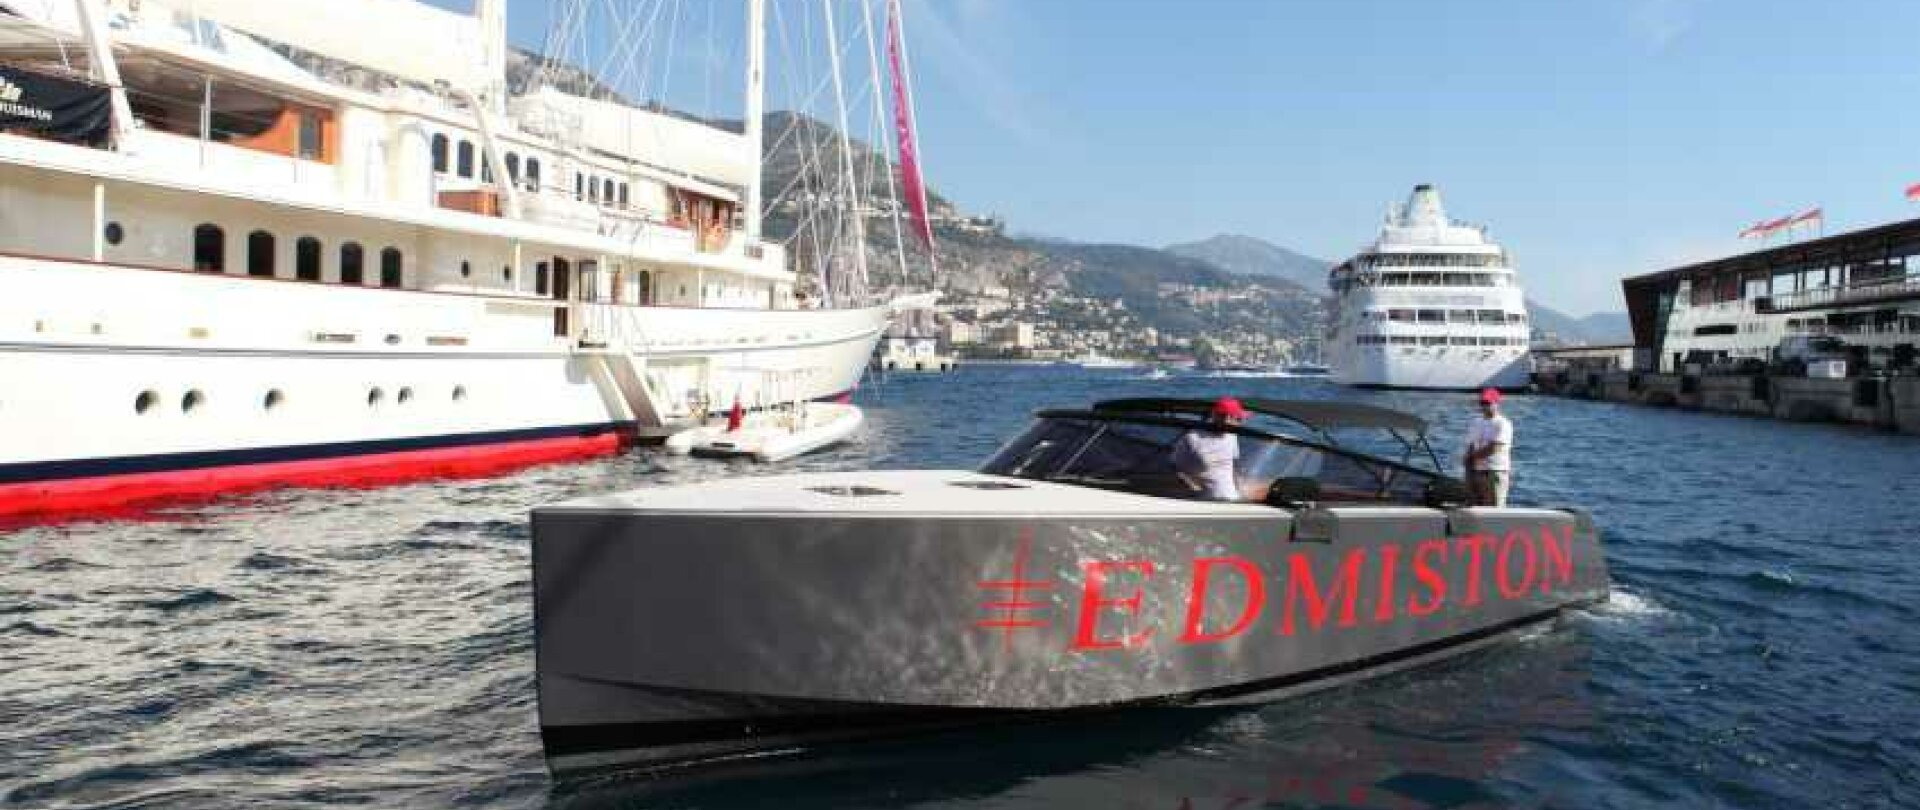 Monaco Yacht Show 2015 photo 4